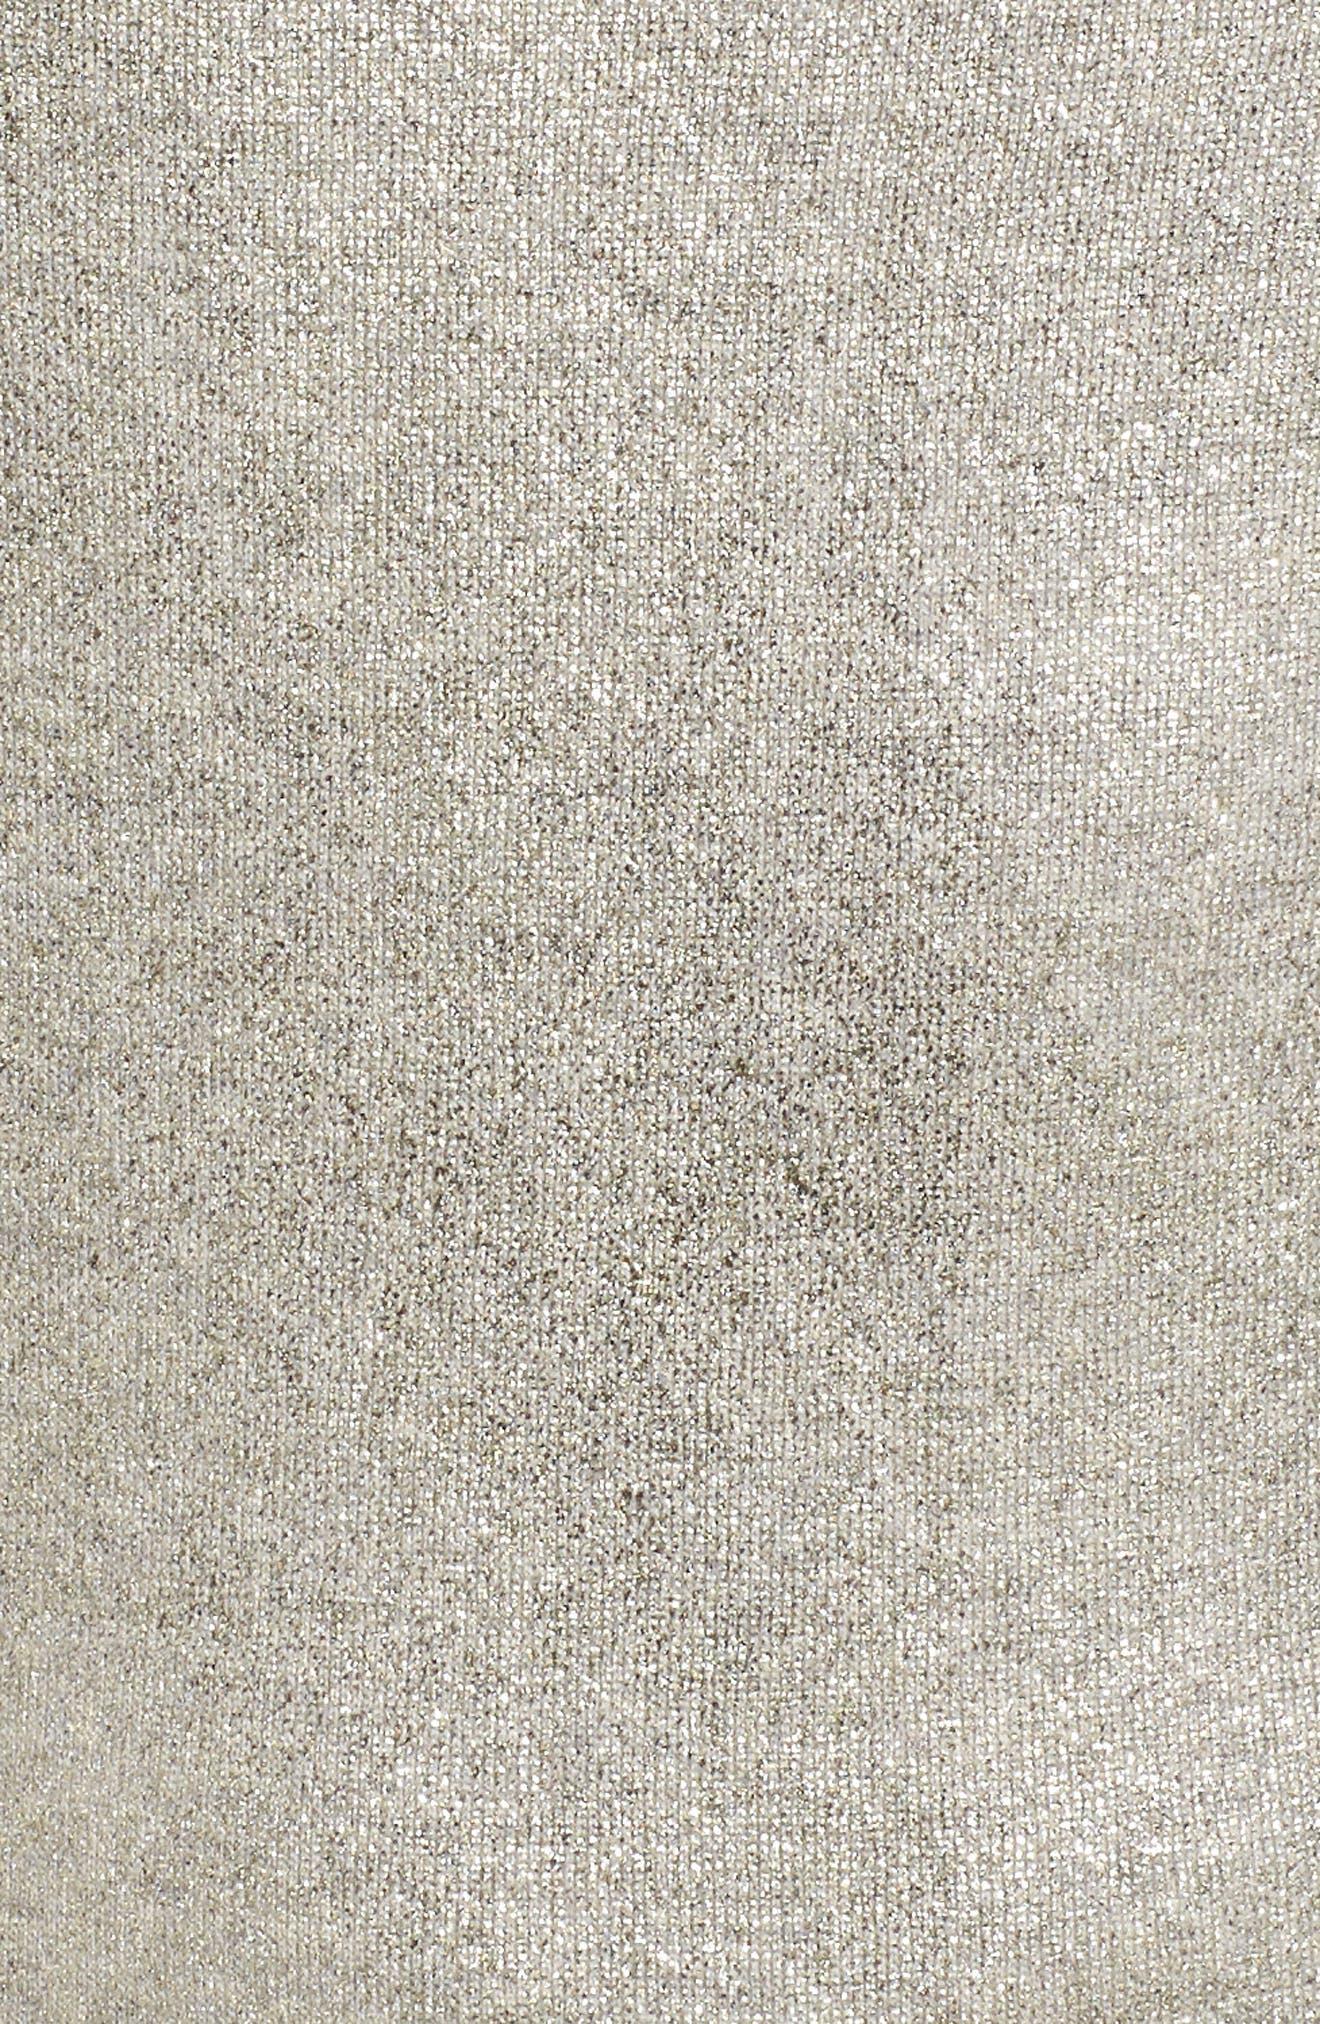 Fadine Wool Crewneck Sweater,                             Alternate thumbnail 5, color,                             Cozy Grey Melange